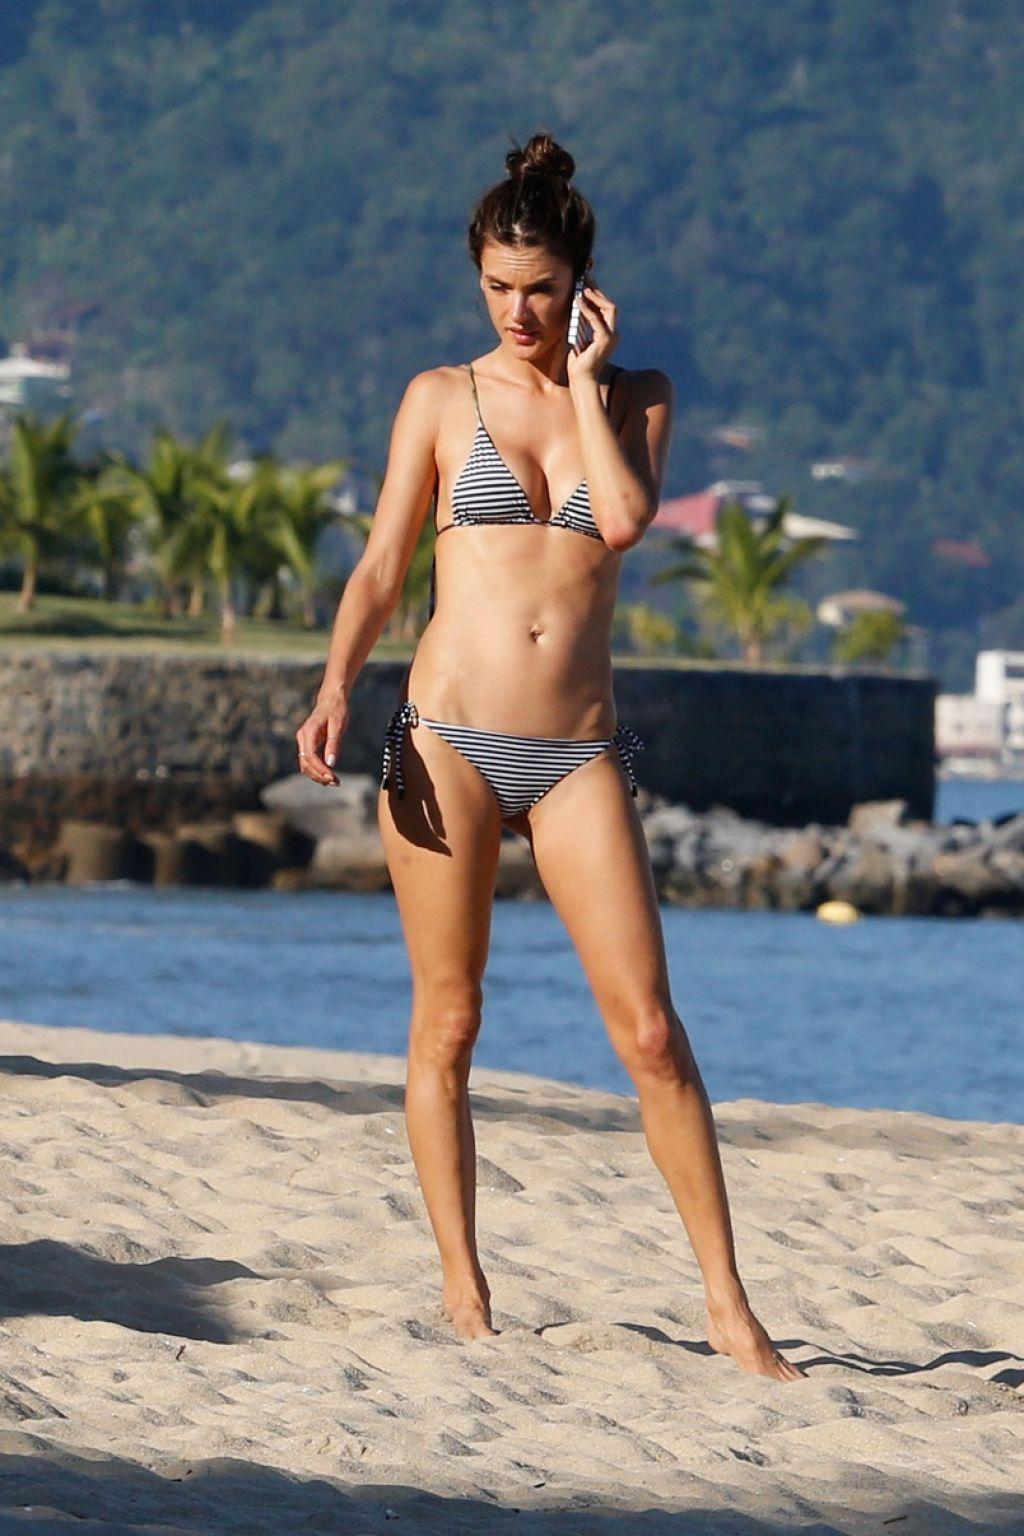 Bikini Alessandra Ambrosio nudes (57 photos), Ass, Hot, Selfie, butt 2020